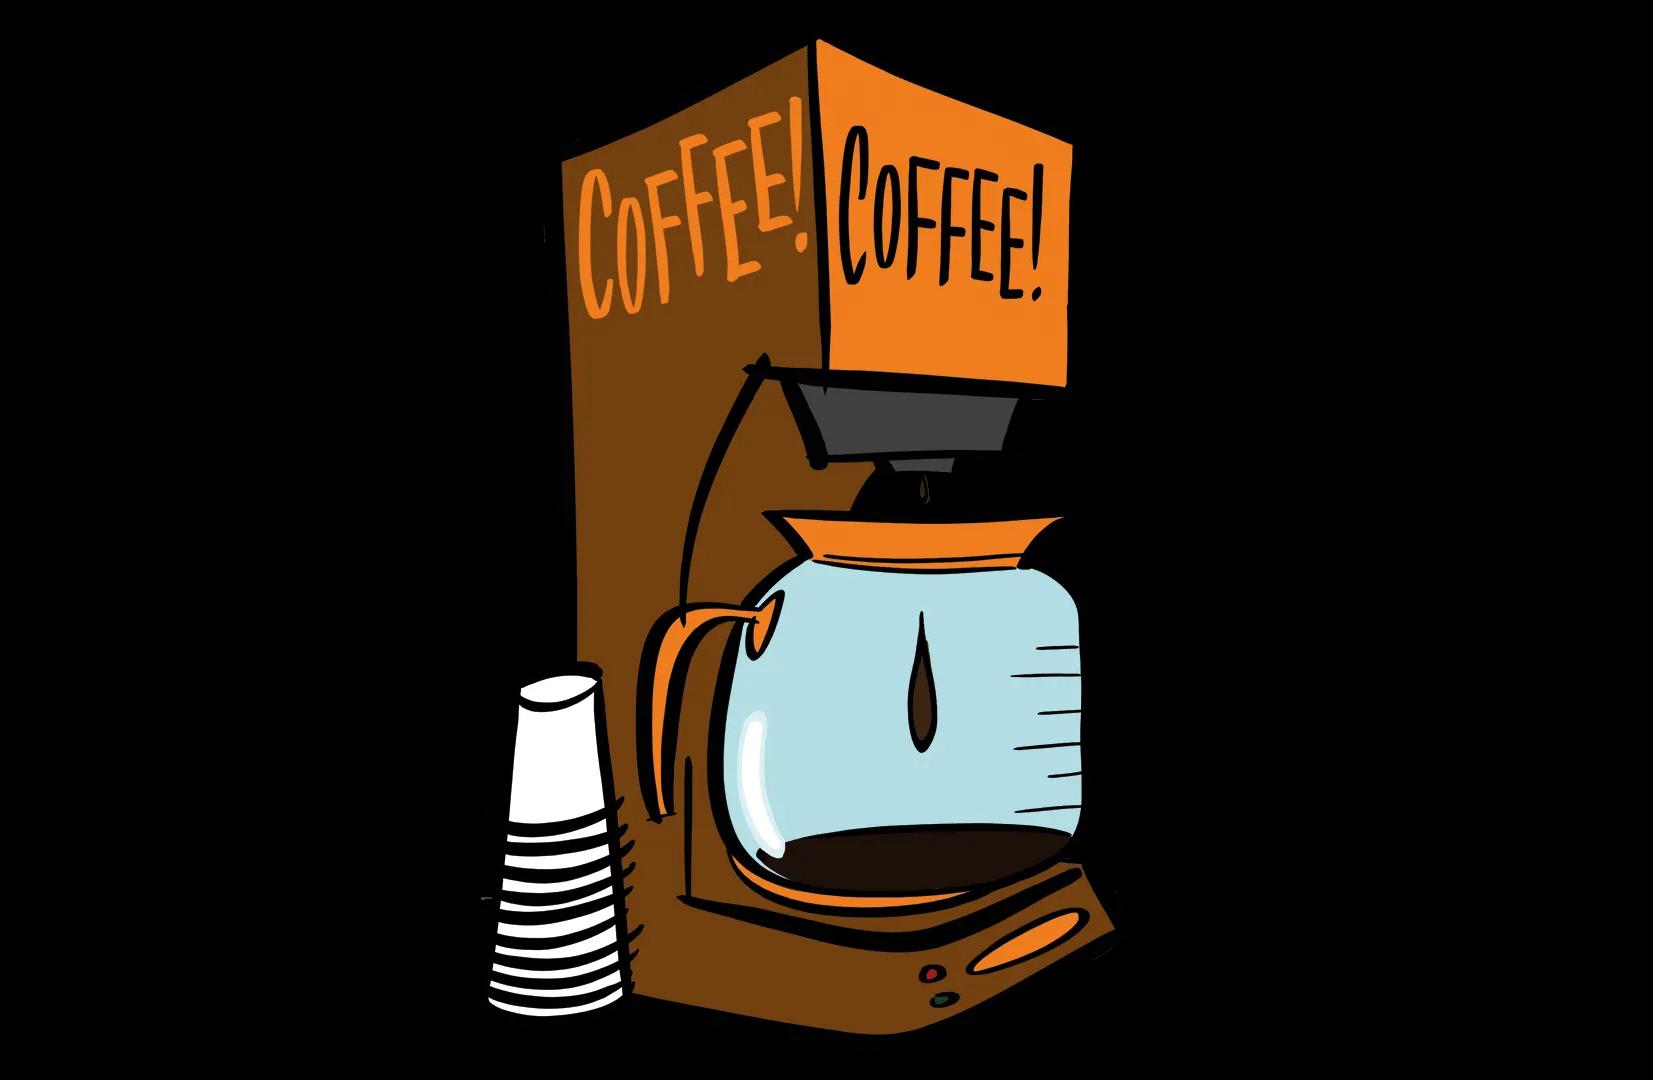 Illustrated coffee